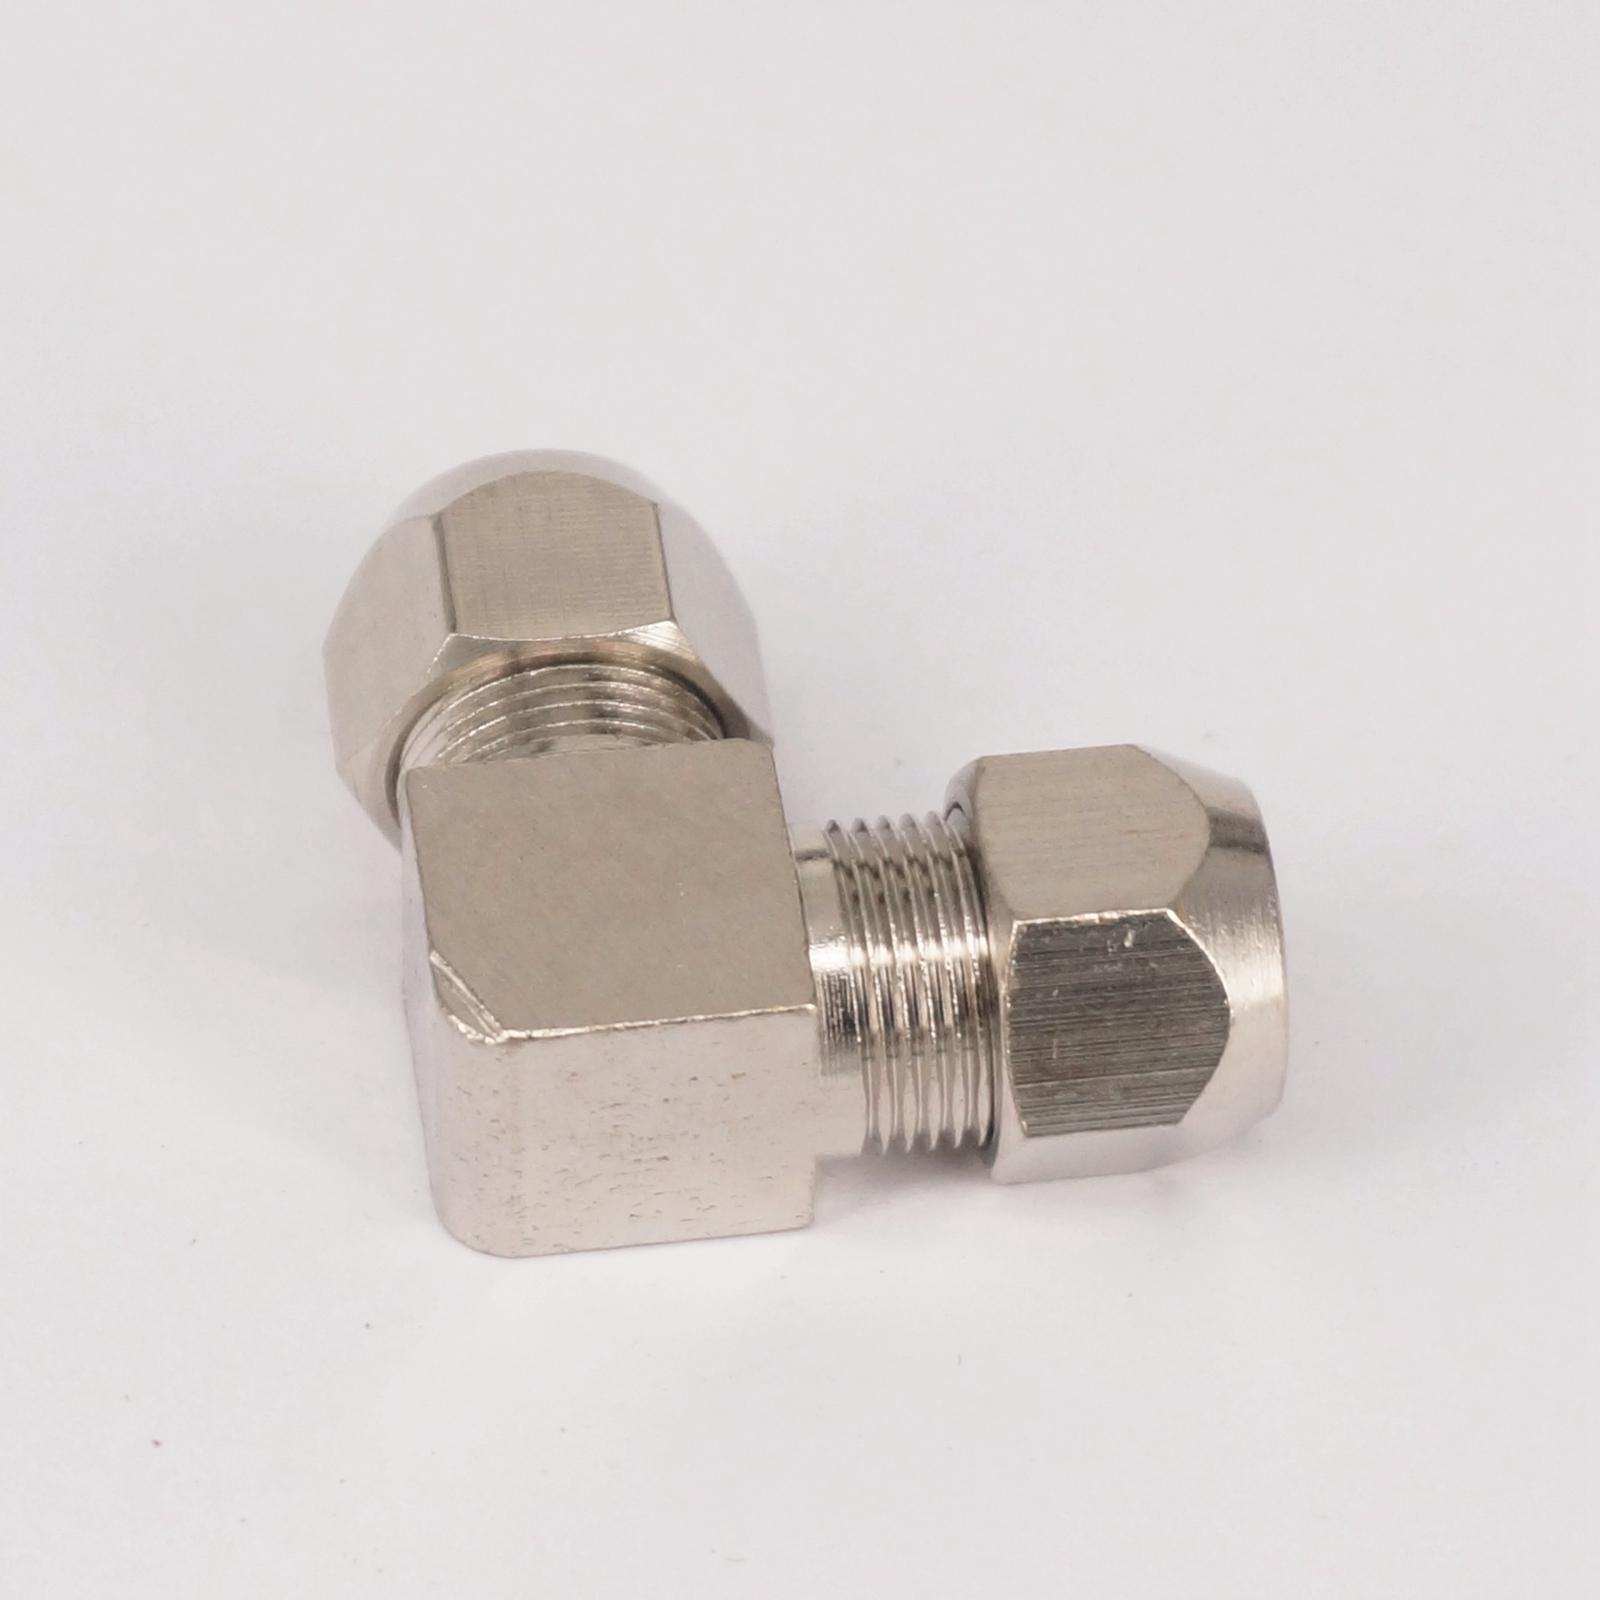 2 pcs Siku Kuningan Cocok 10mm OD Tabung Coupler Adapter Konektor Kompresi pas Untuk Tubing